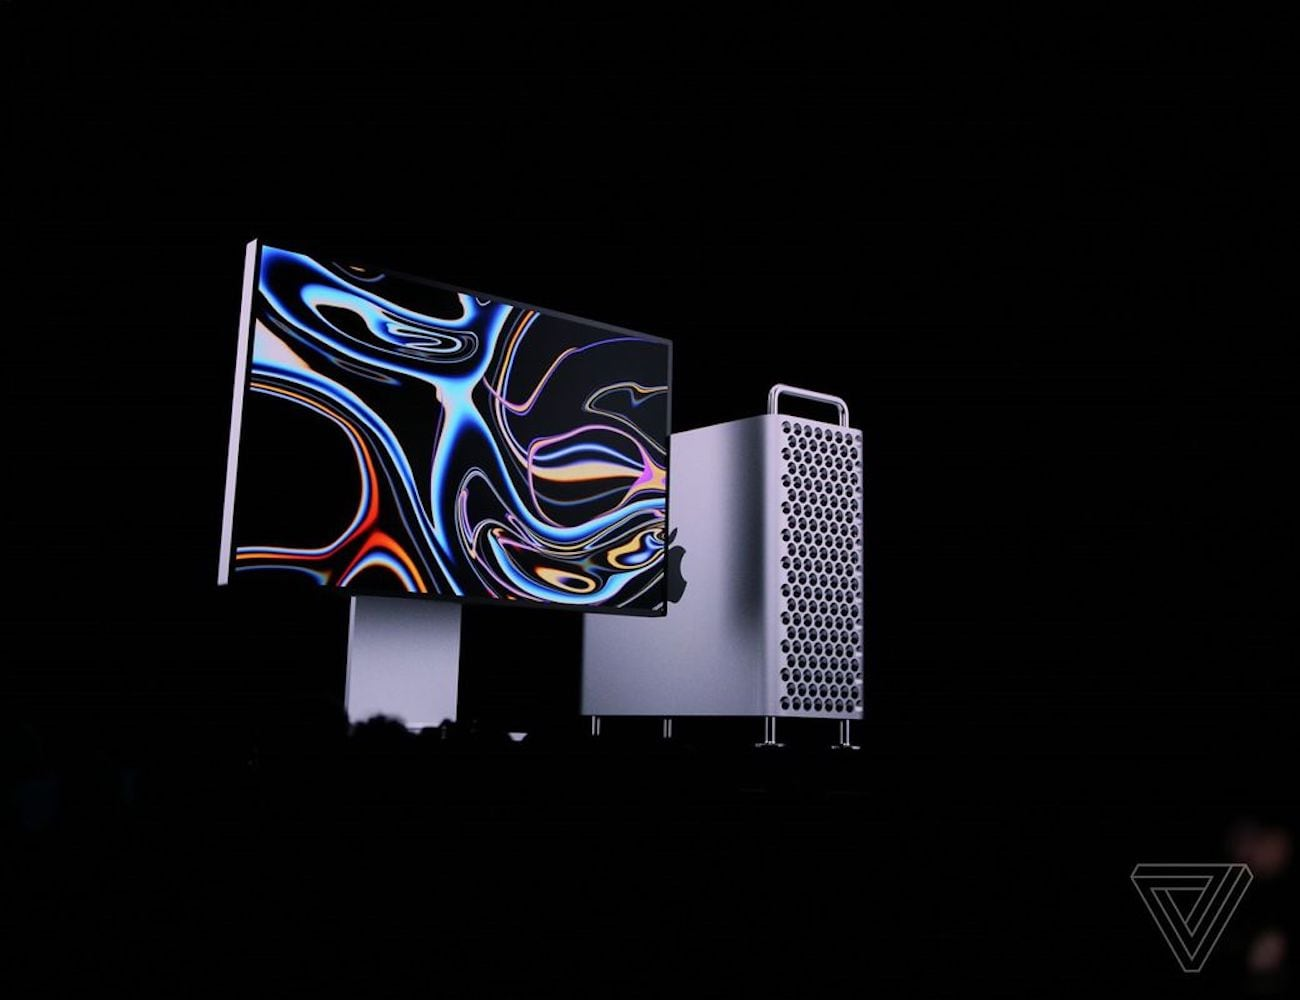 Apple 6K Pro Display XDR